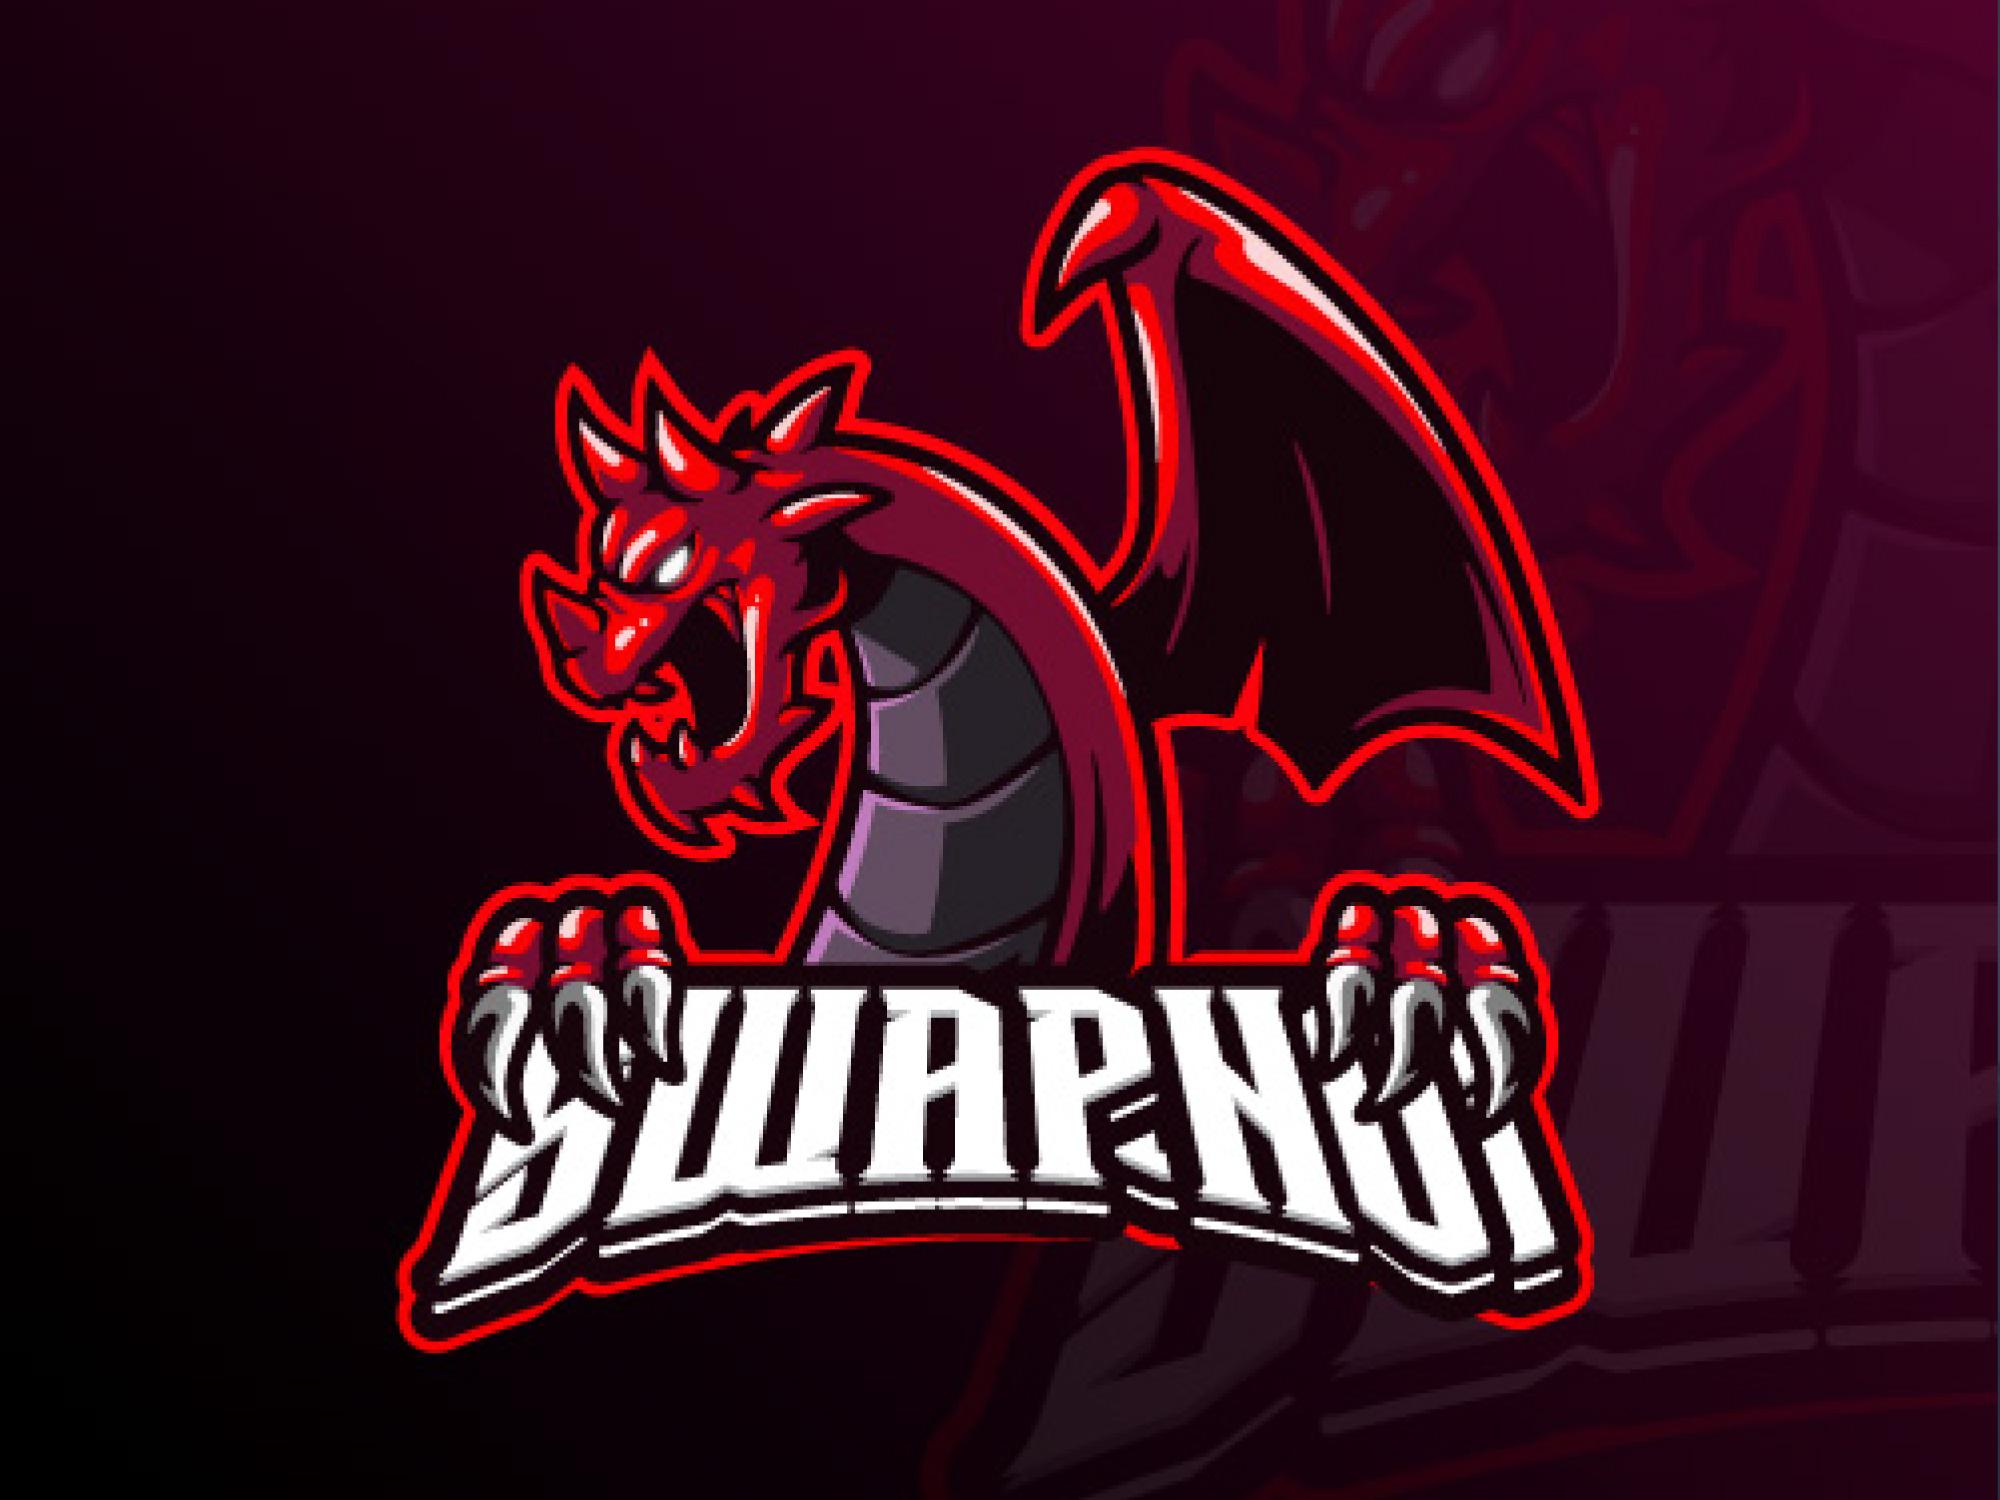 I will create do professional gaming logo design